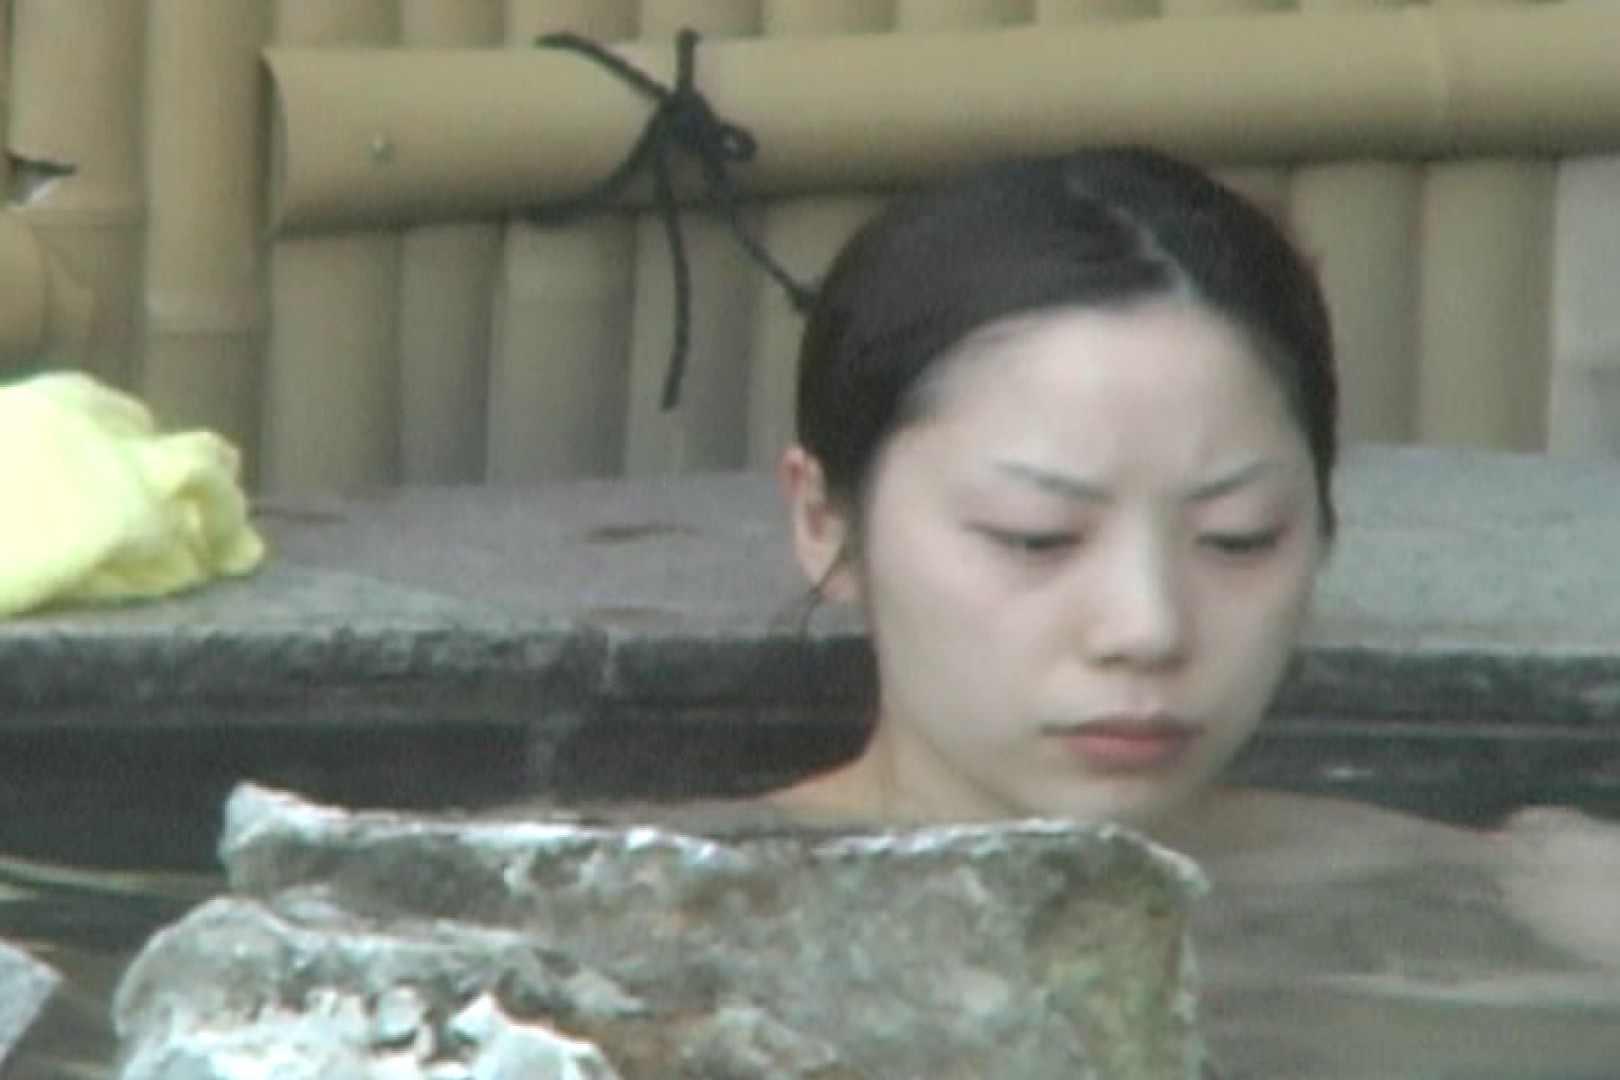 Aquaな露天風呂Vol.596 盗撮シリーズ | 露天風呂編  113PIX 41